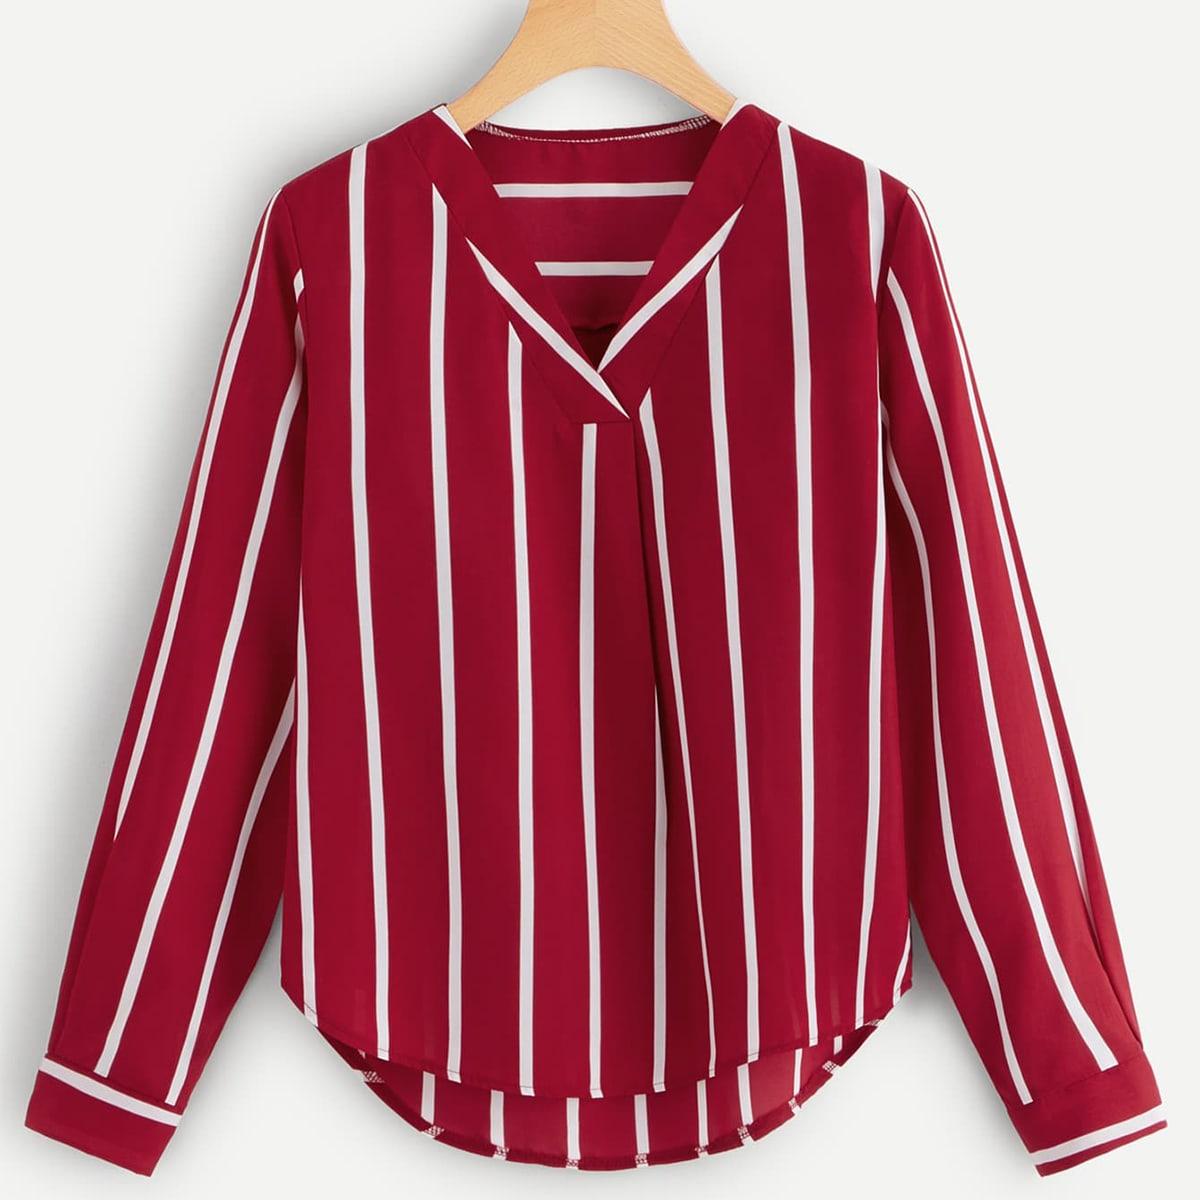 Verticaal gestreepte blouse